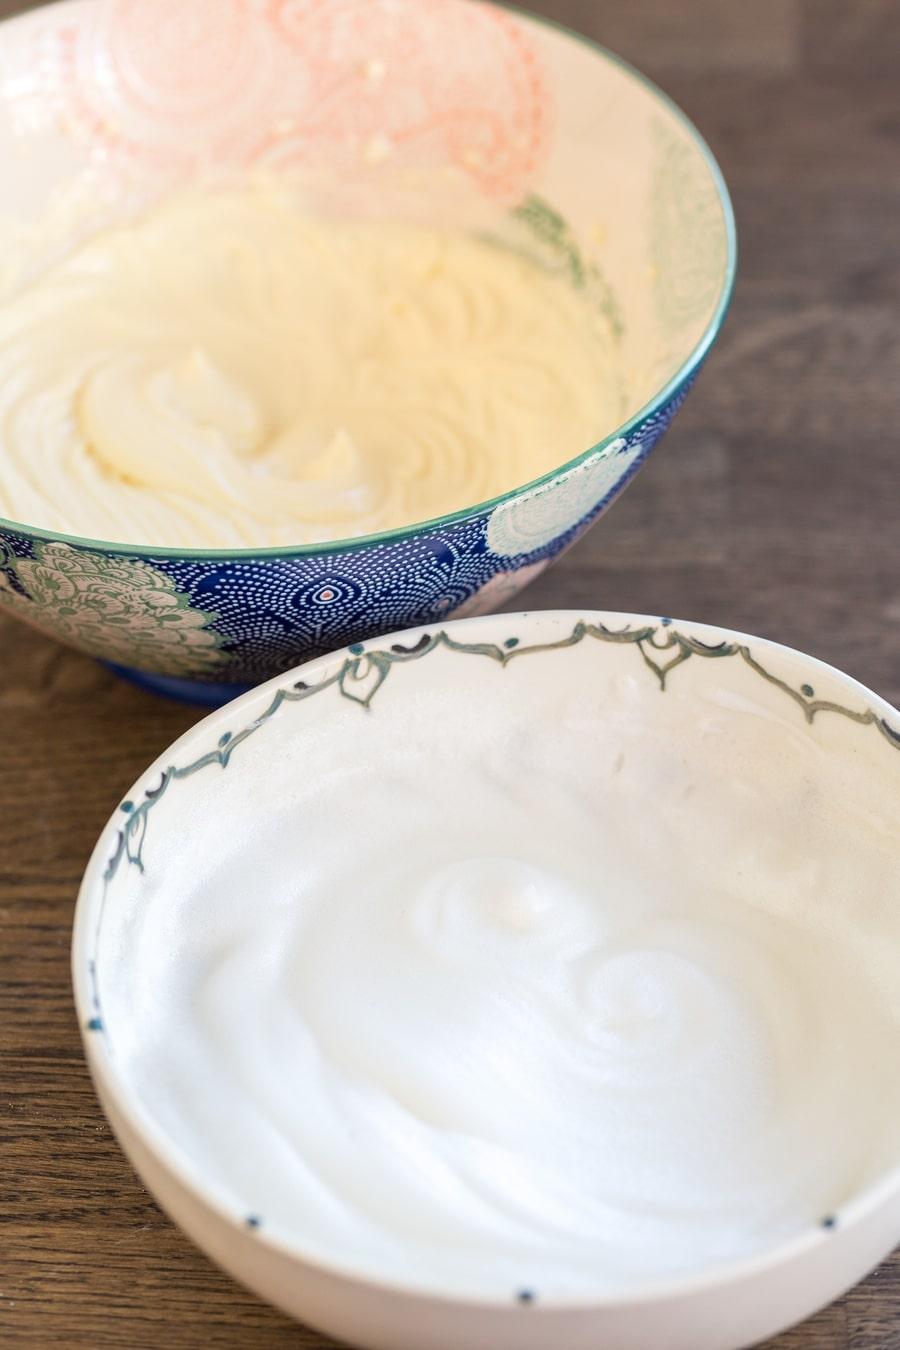 One bowl with beaten egg whites, one bowl with mascarpone and egg yolk cream.